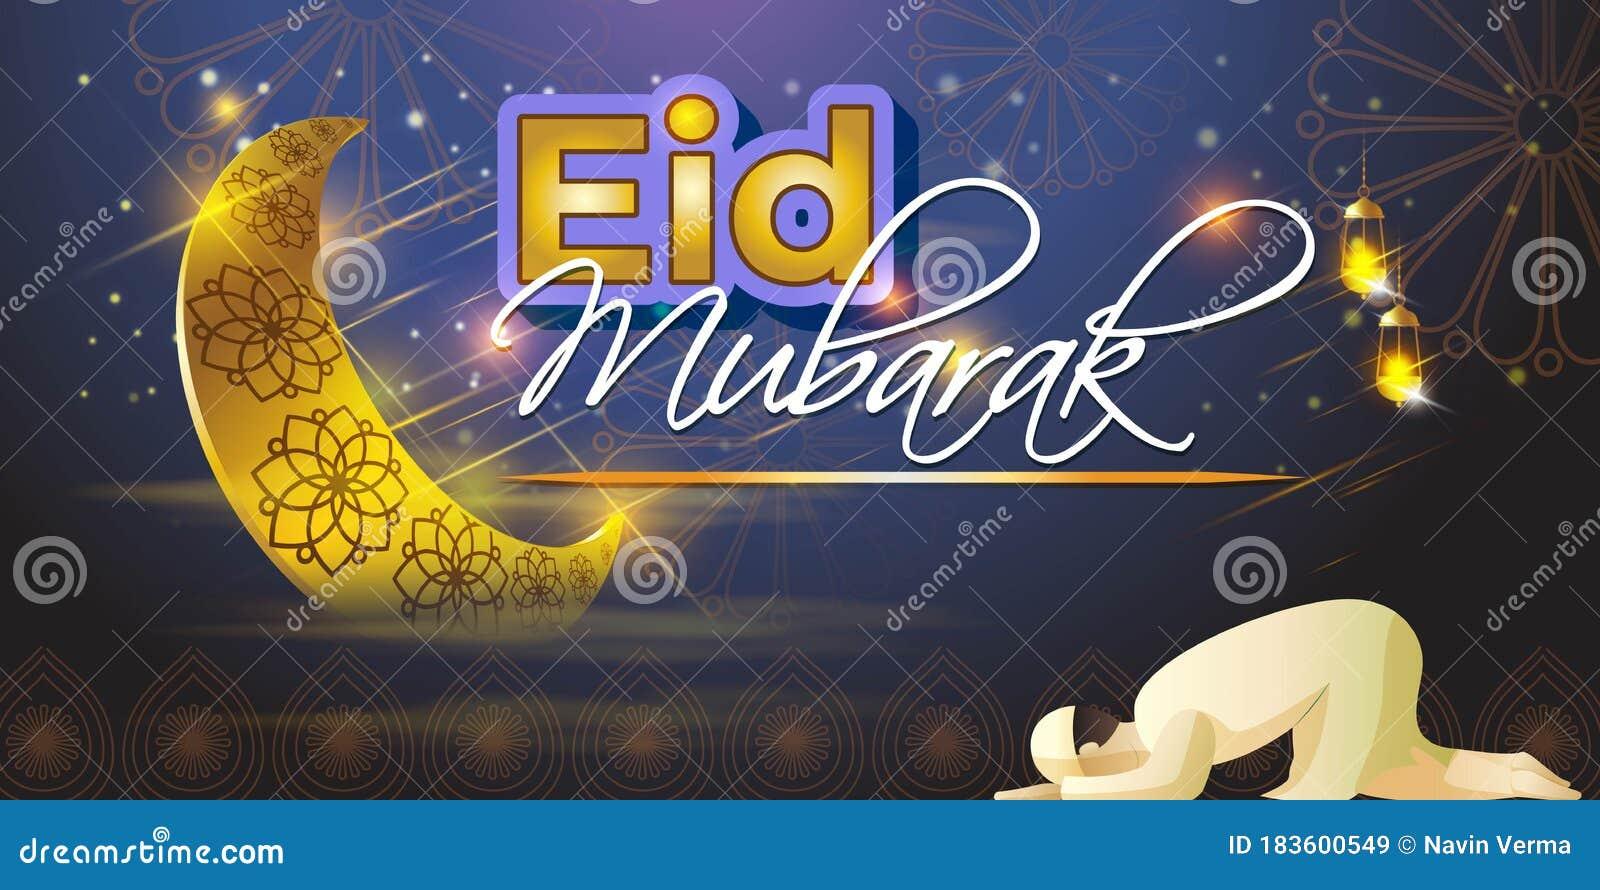 vector illustration of greeting for eid mubarak sending